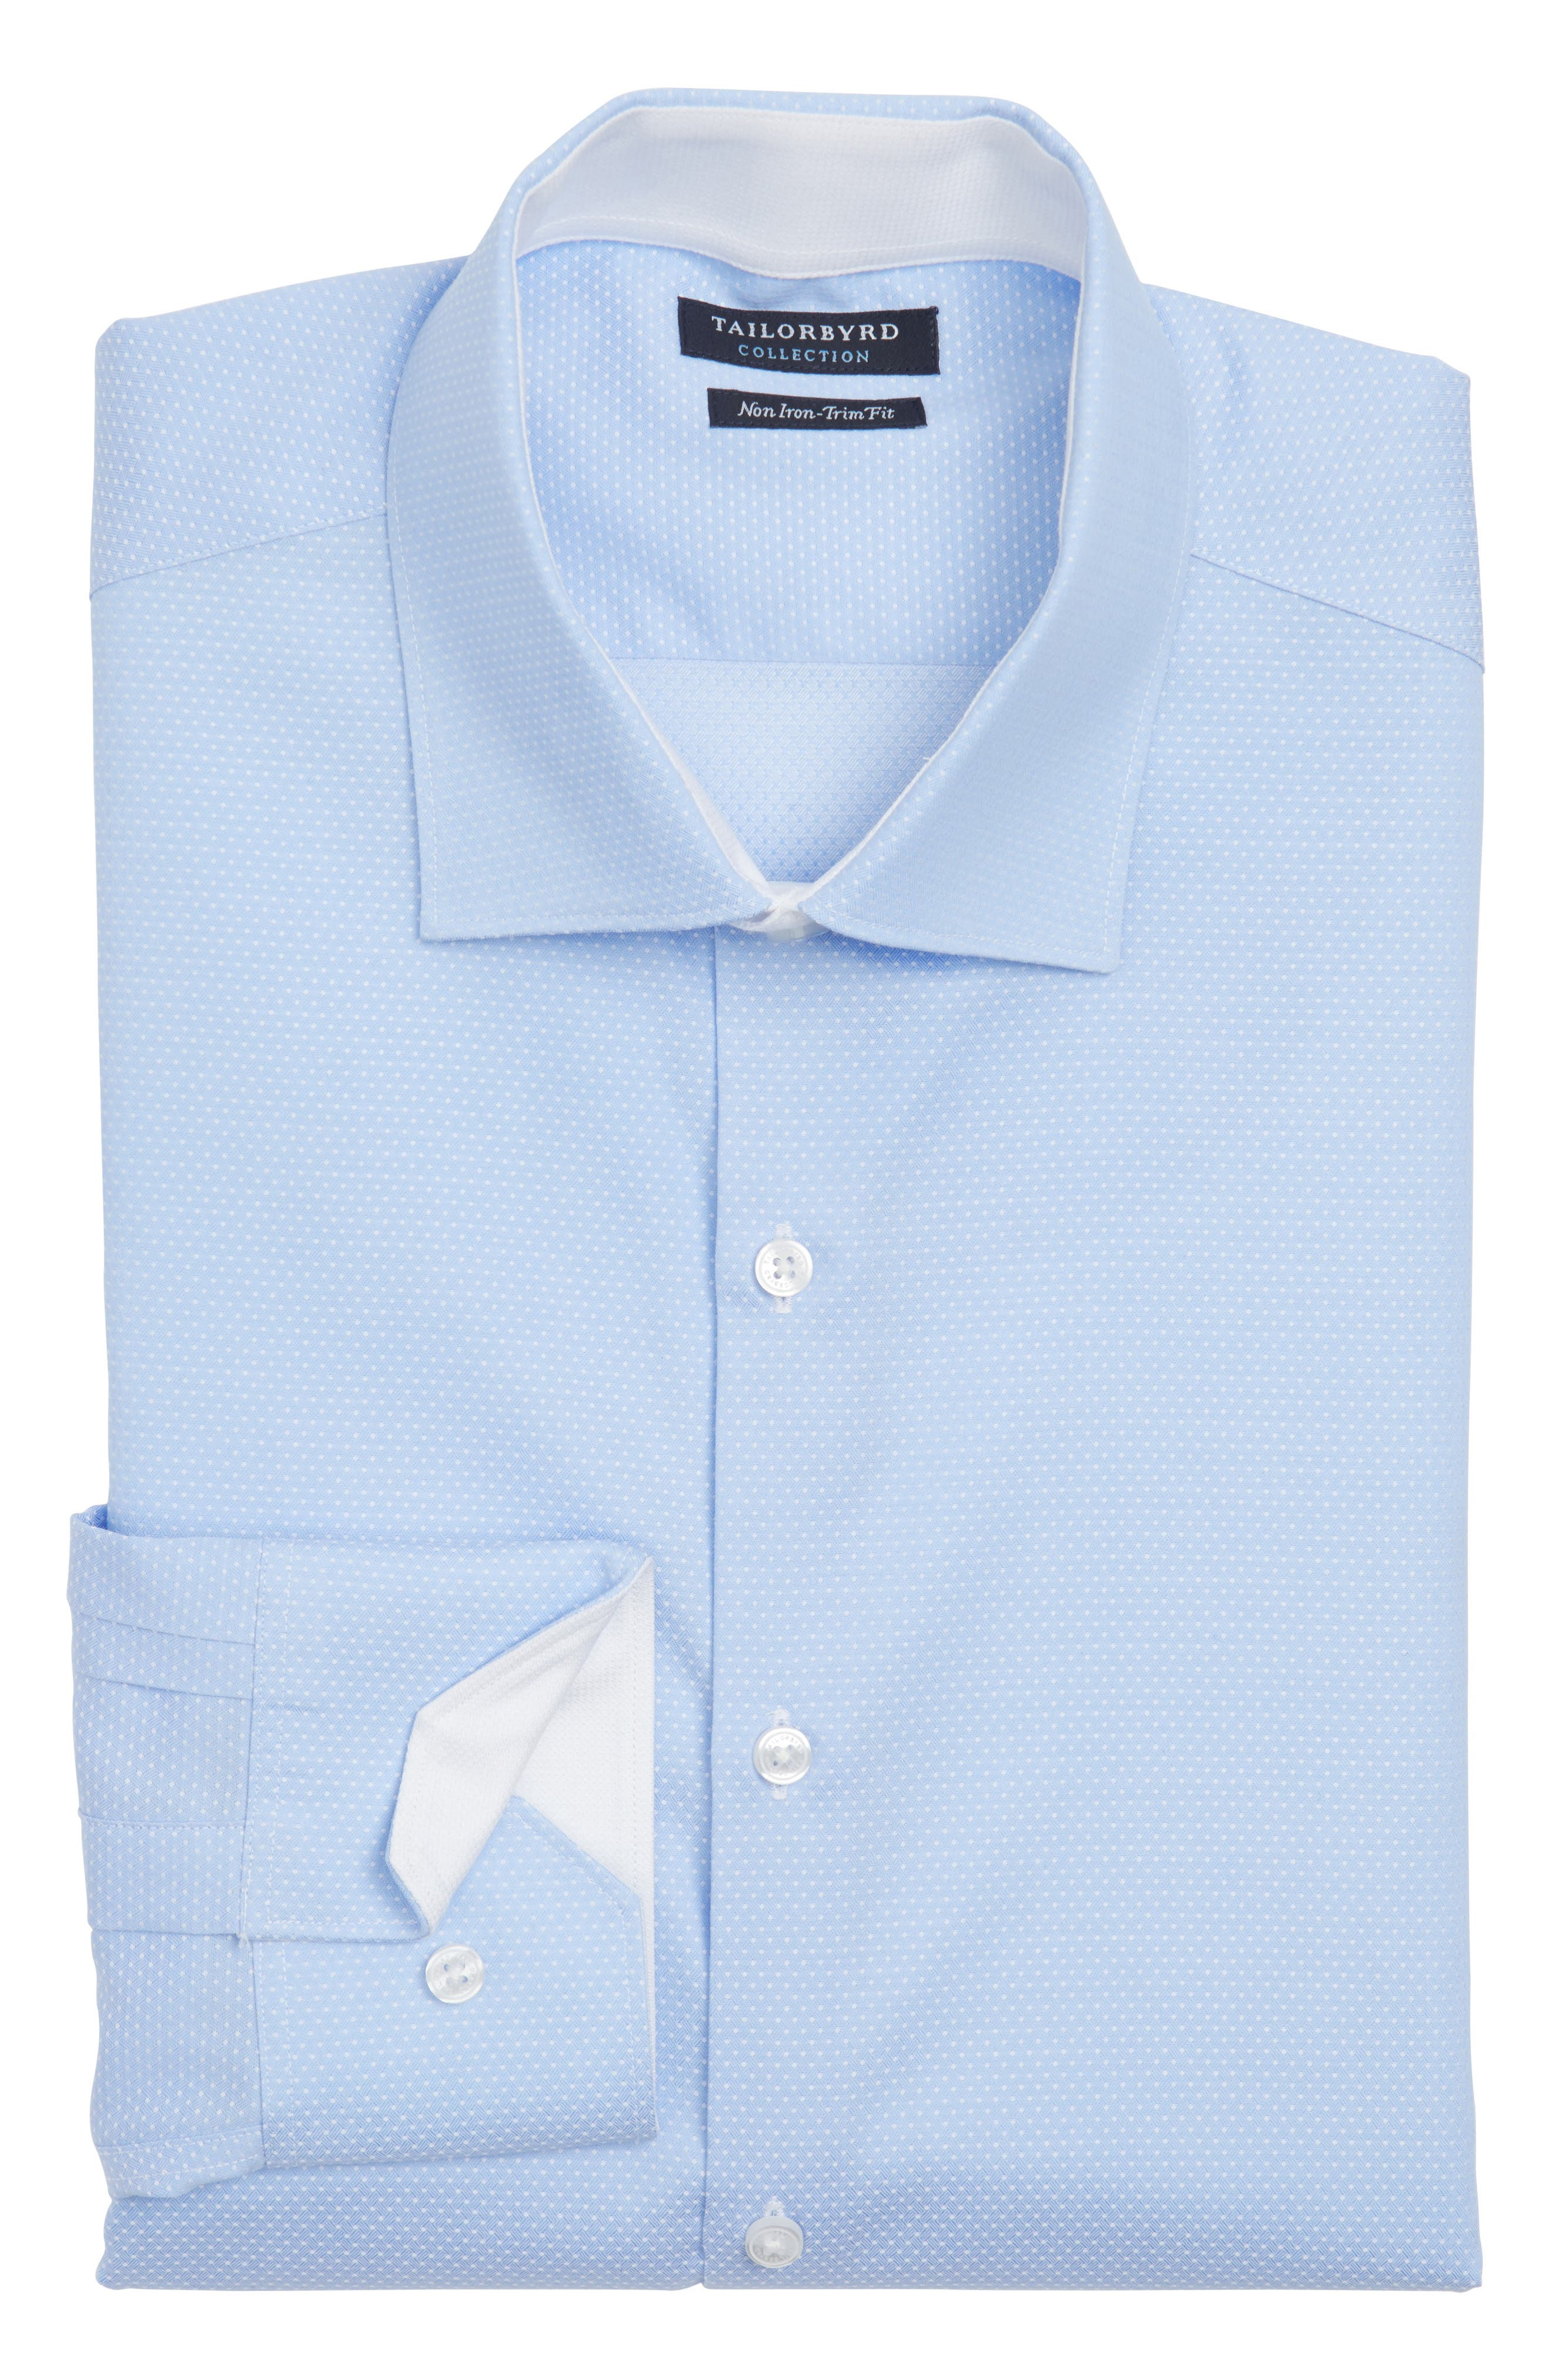 Main Image - Tailorbyrd Trim Fit Non-Iron Dot Dress Shirt